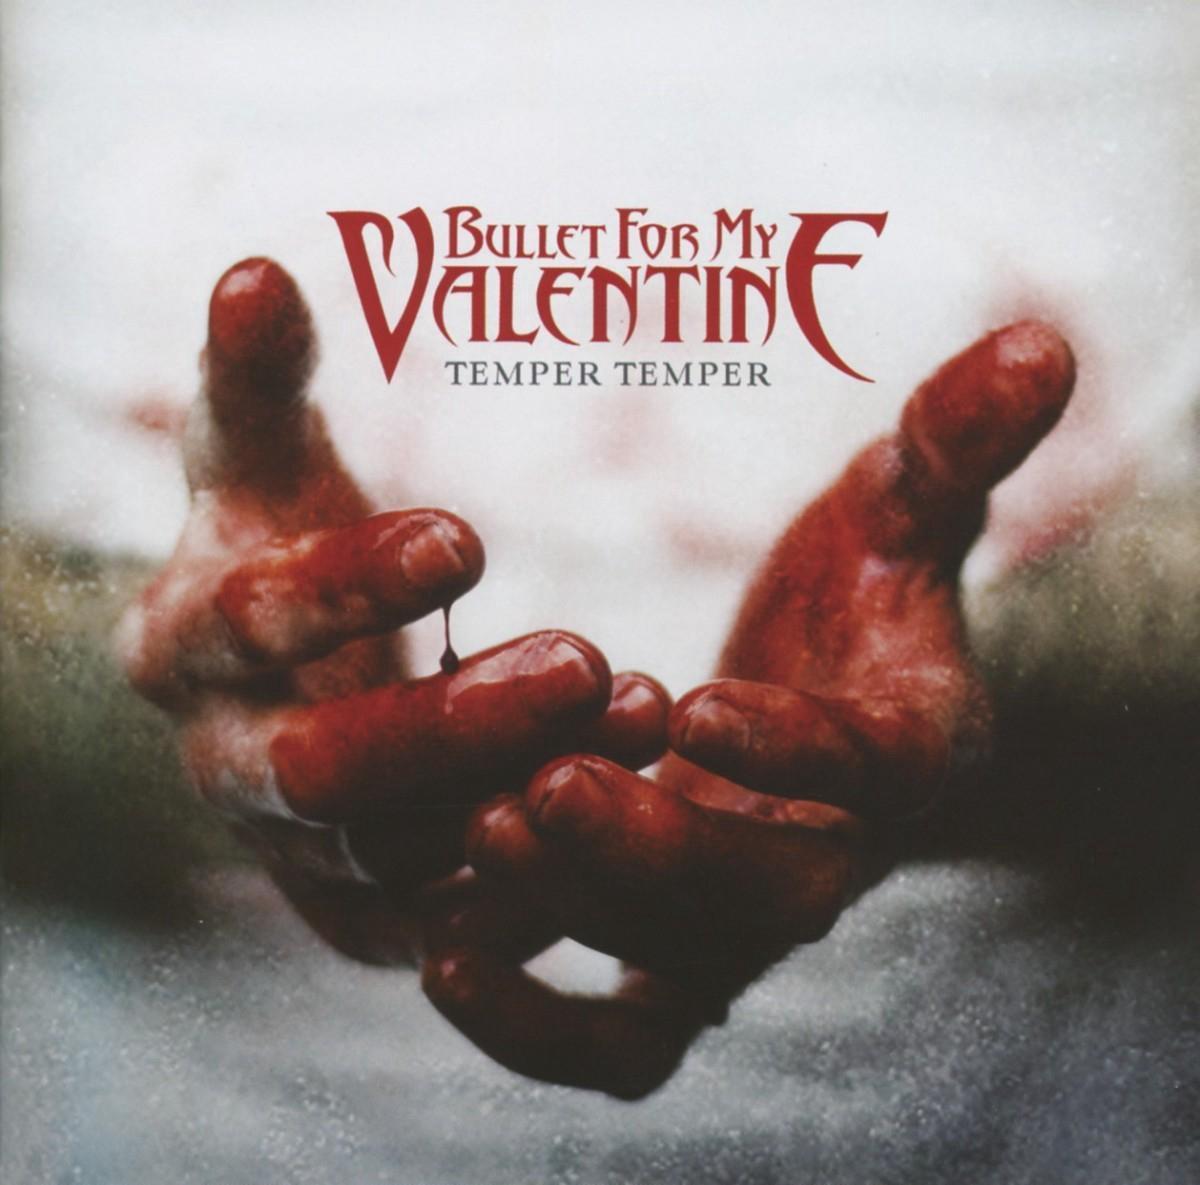 Temper Temper (Deluxe Edition) - Bullet for My Valentine